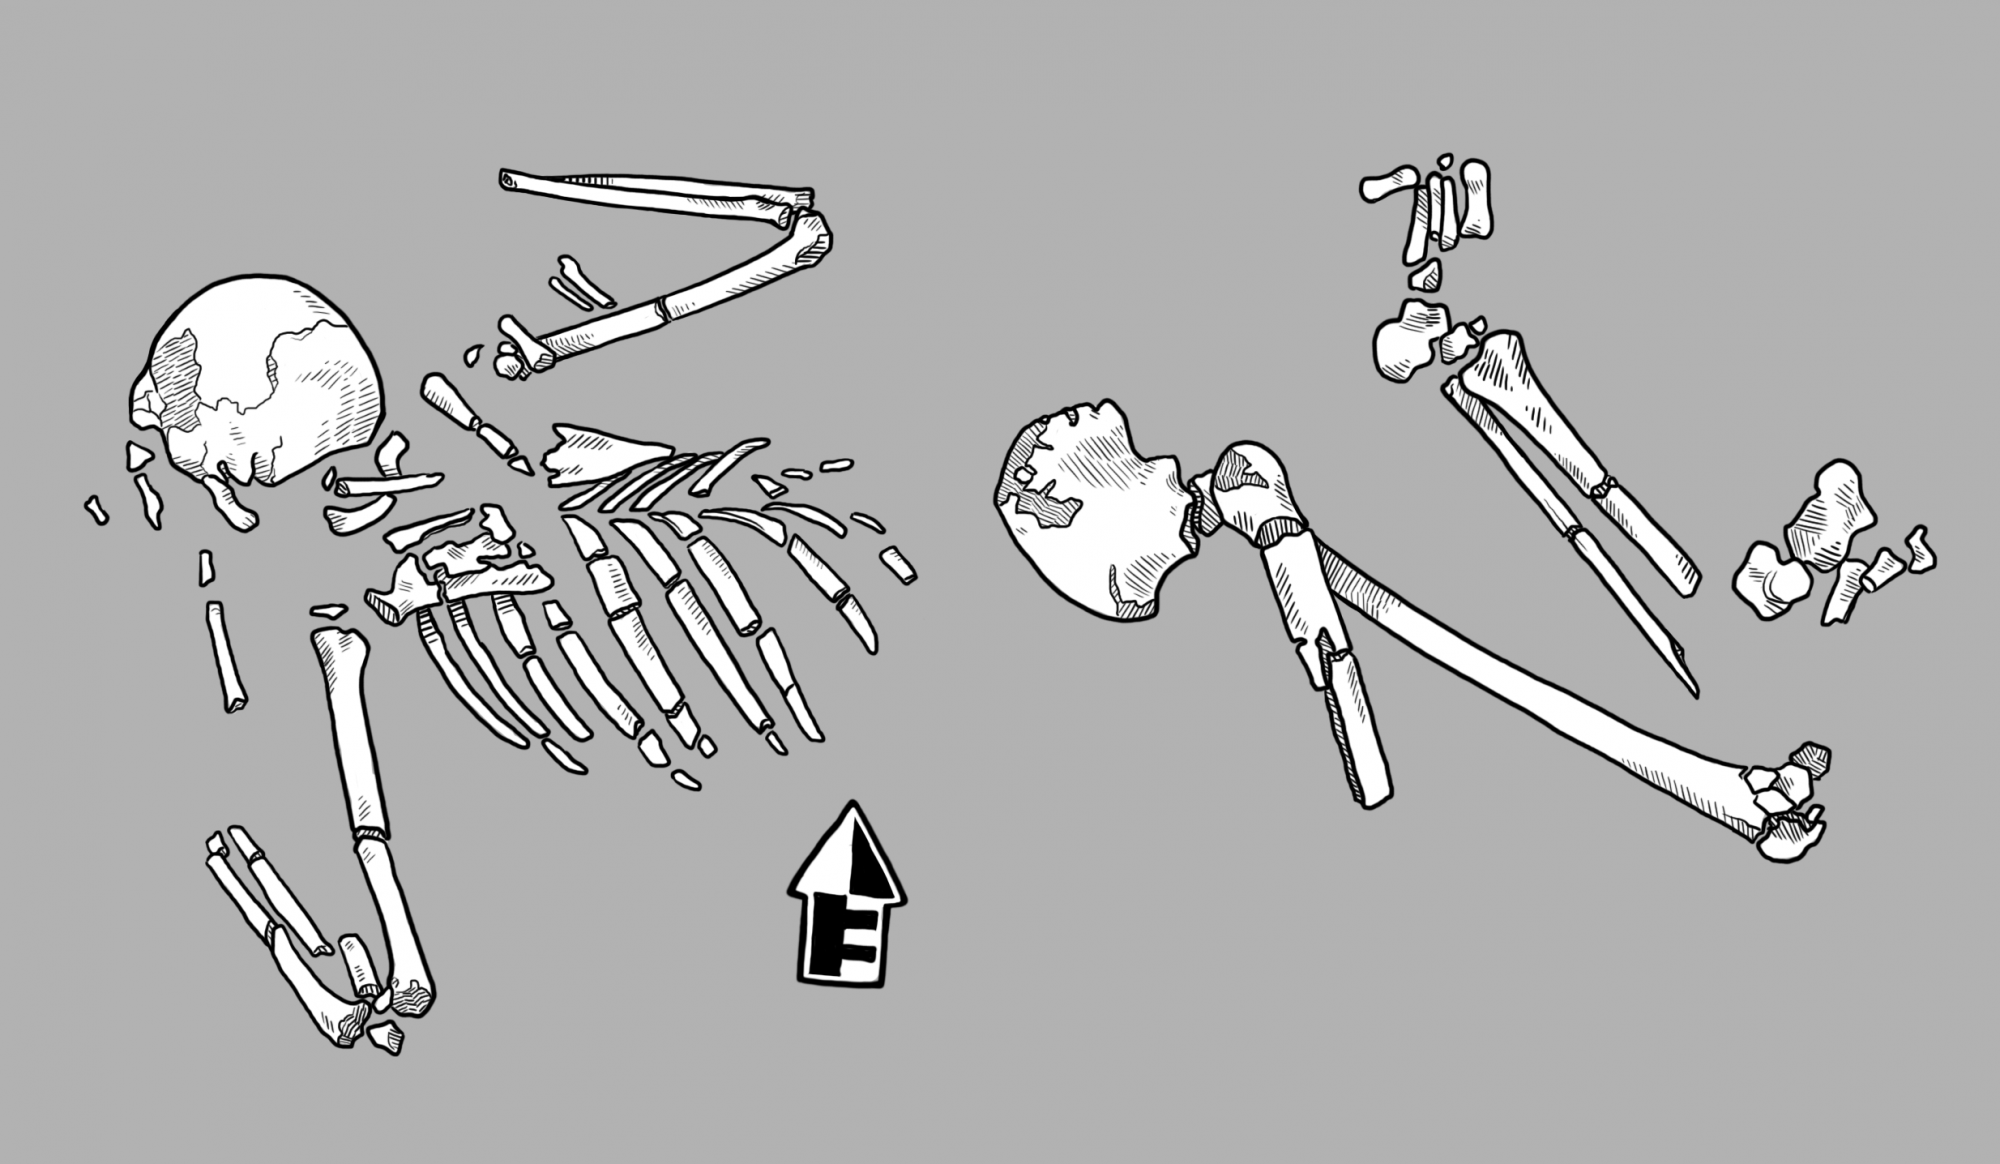 Atypical burials often include broken bones and other signs of violent death.